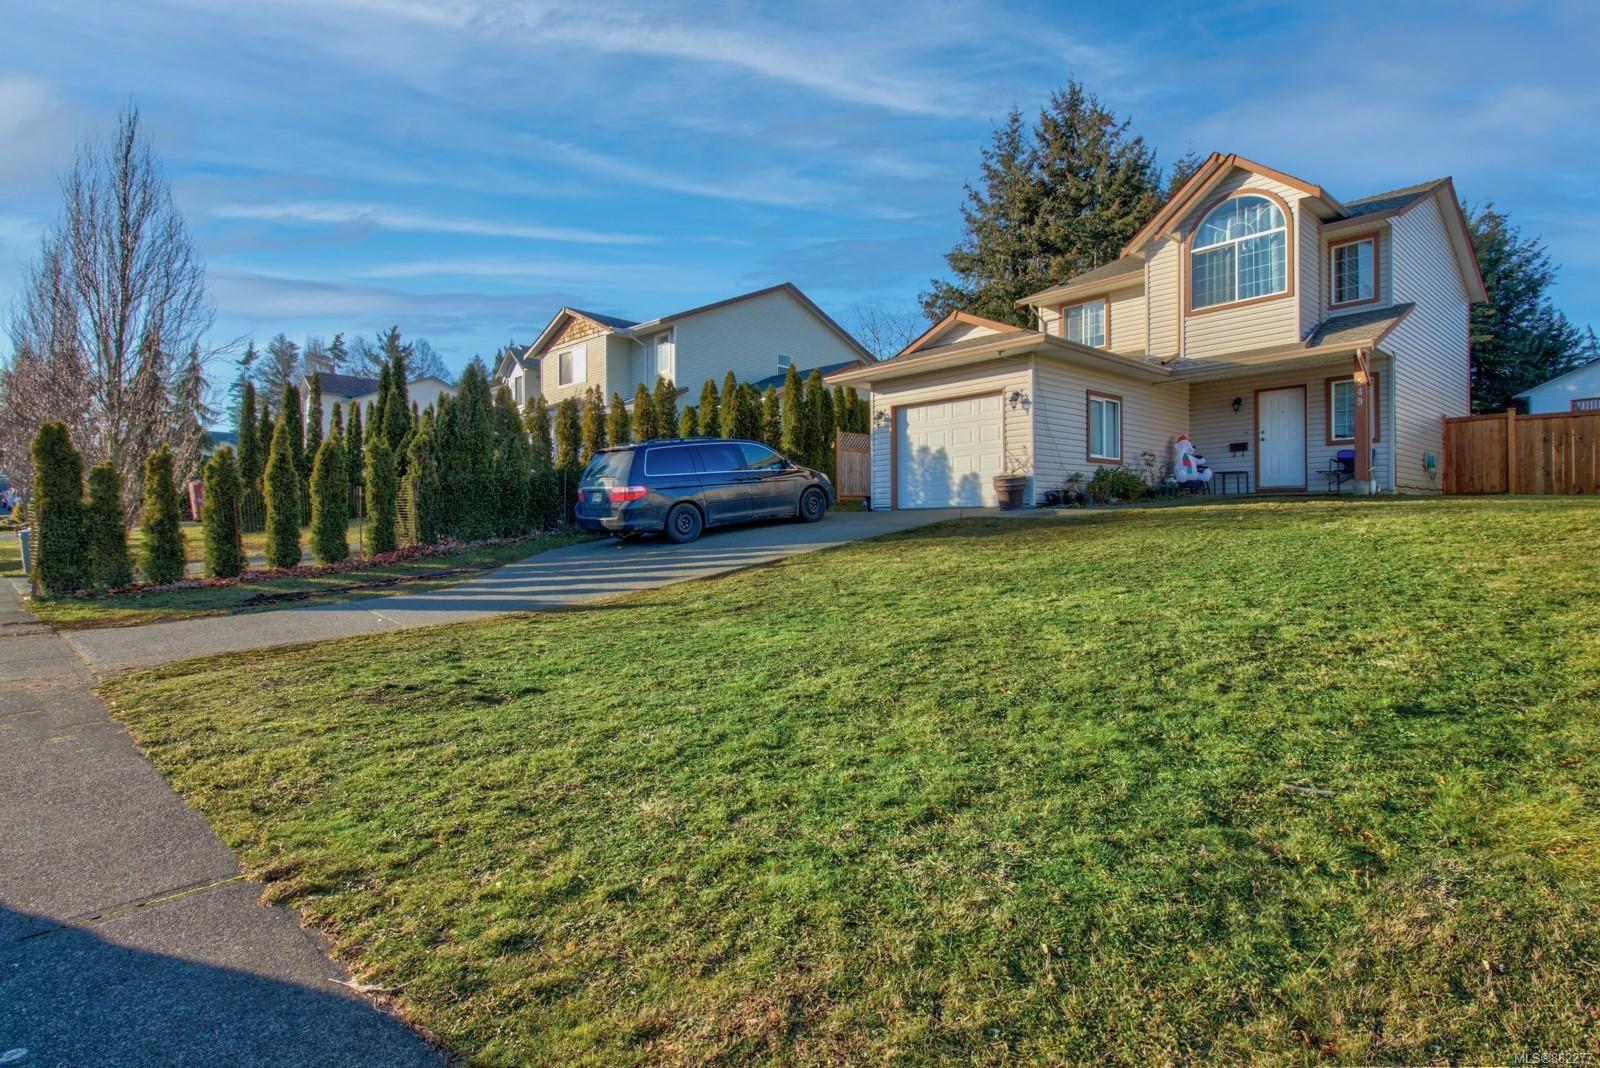 Main Photo: 549 Deerwood Pl in : CV Comox (Town of) House for sale (Comox Valley)  : MLS®# 862277